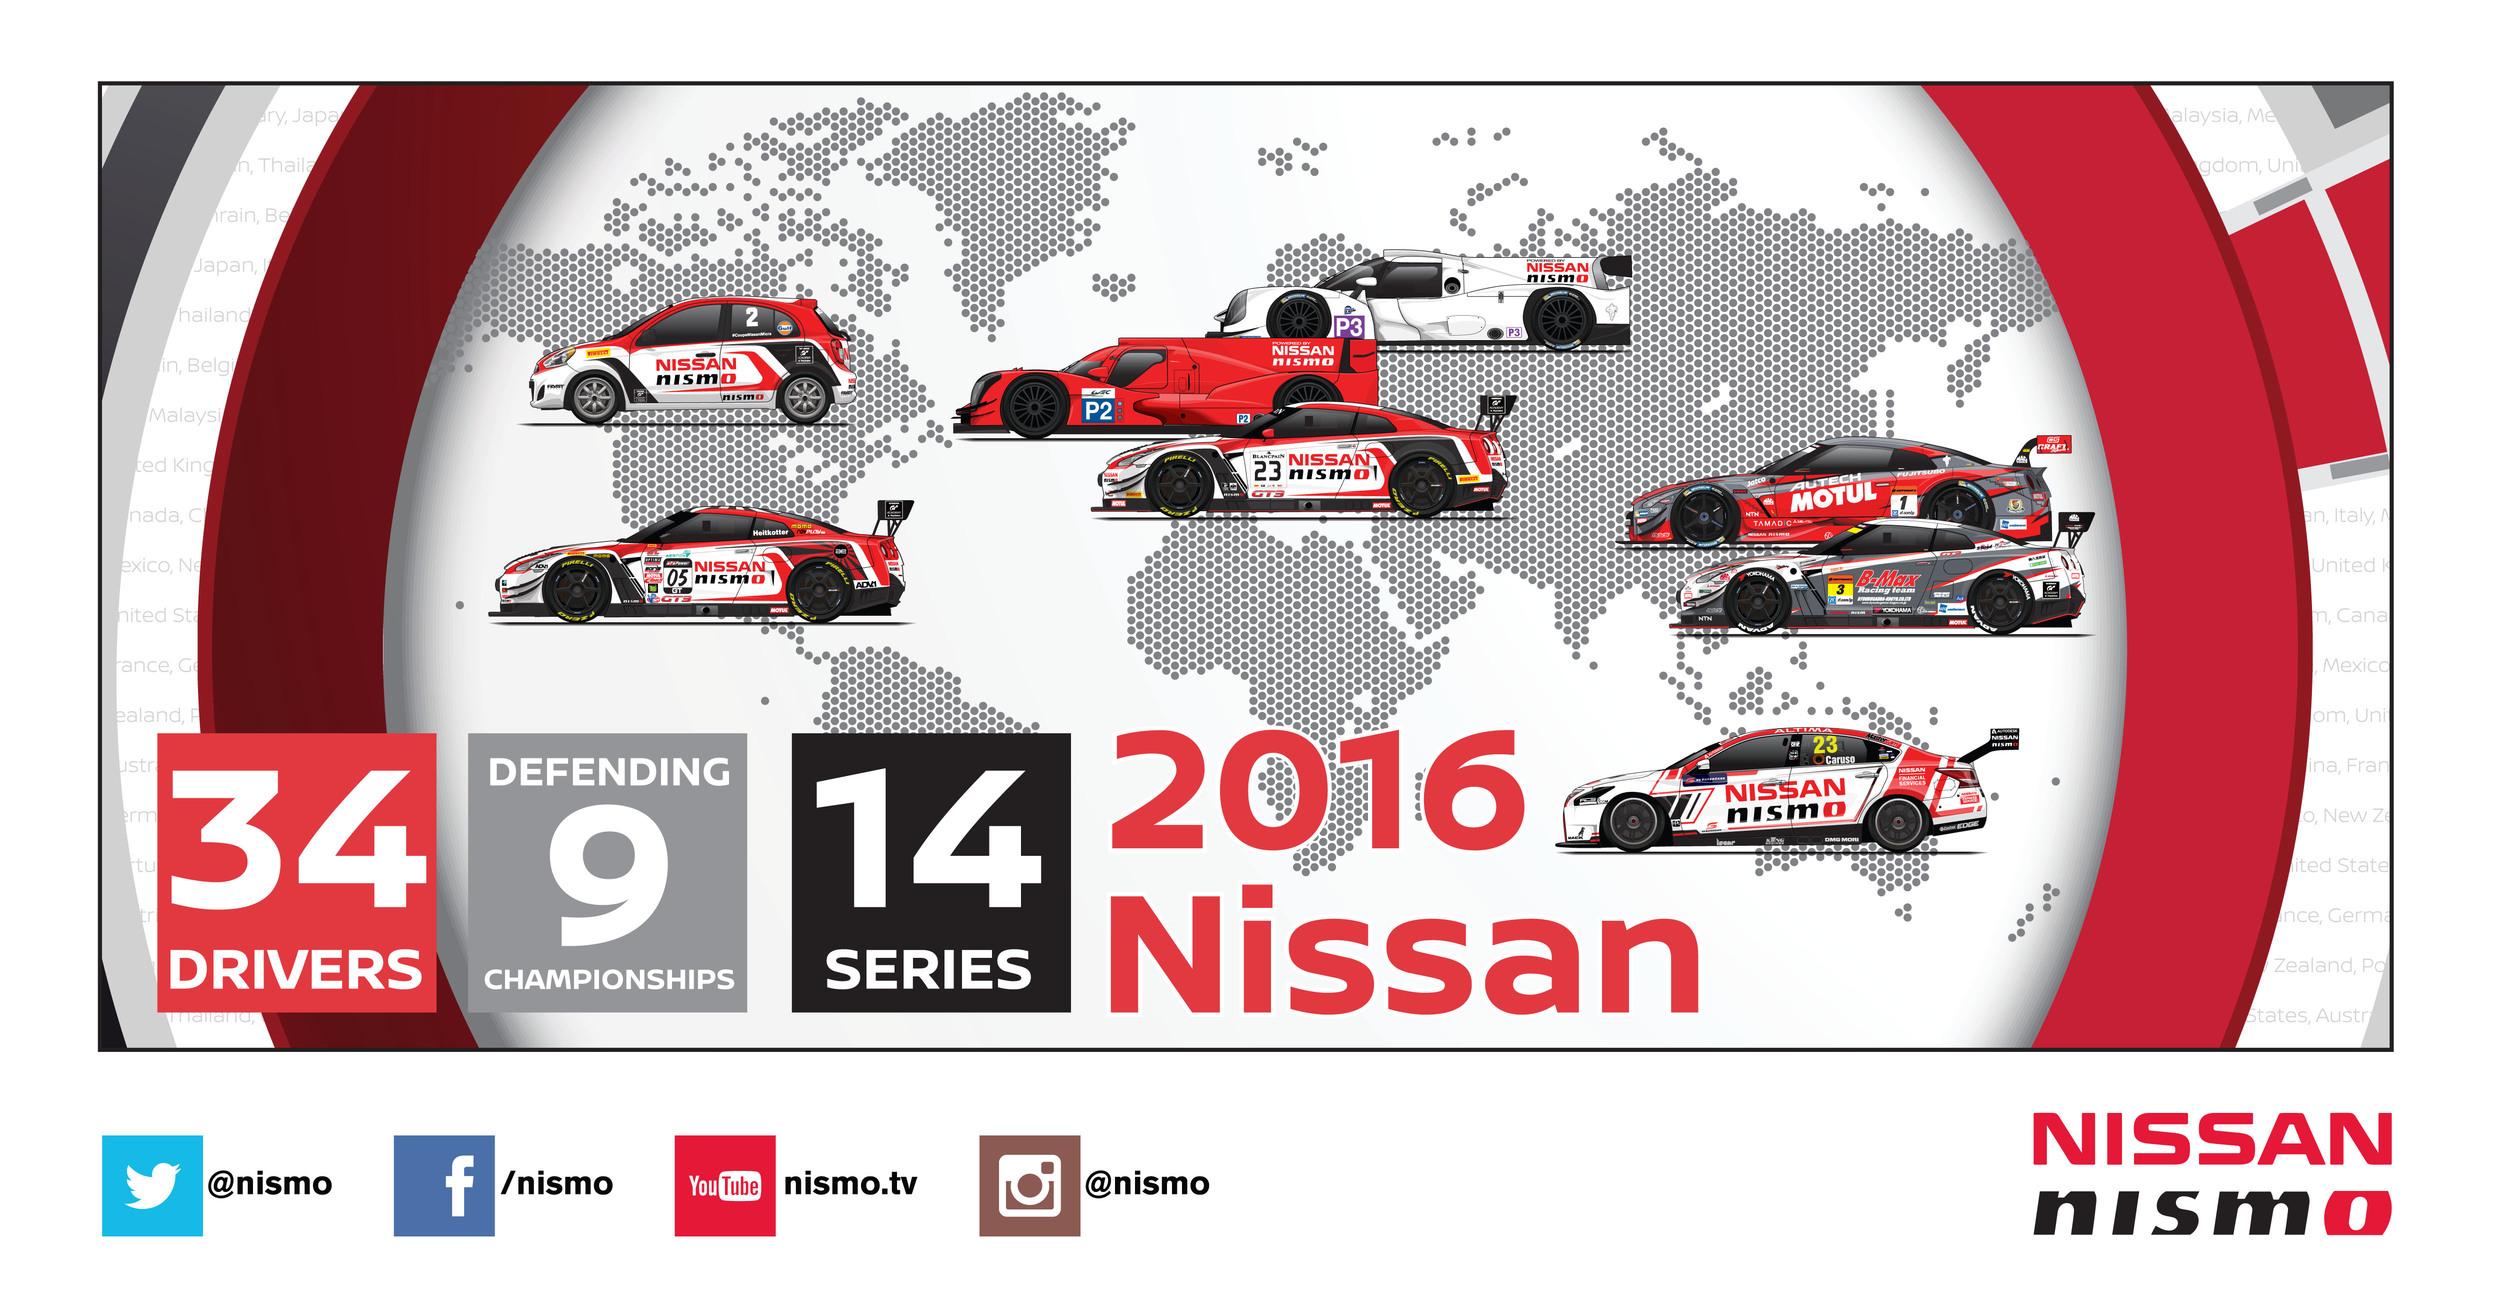 2016_nismo_infographic_2.jpg